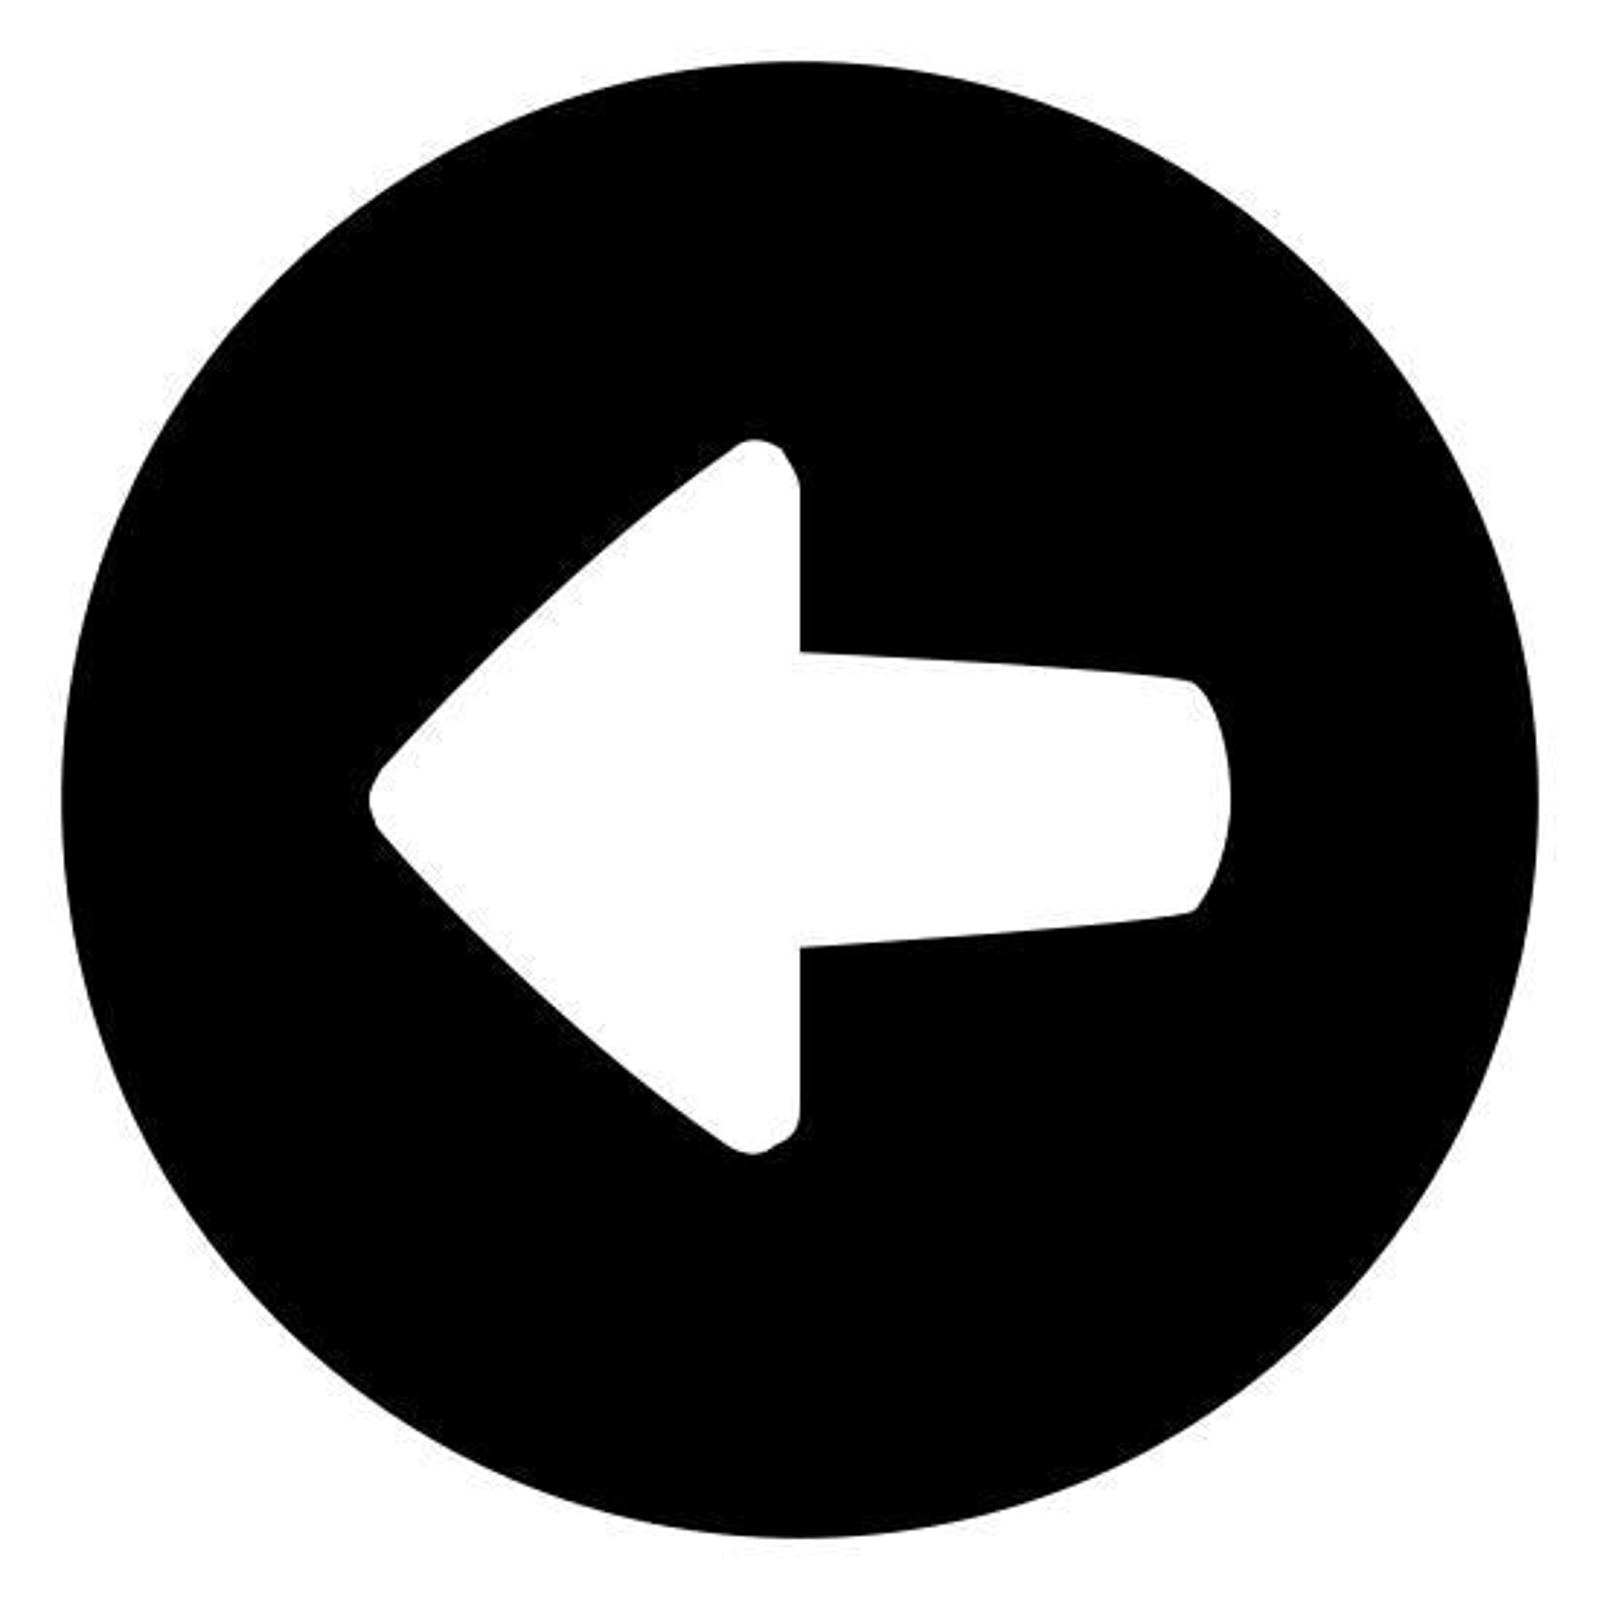 Lewo w kółku icon